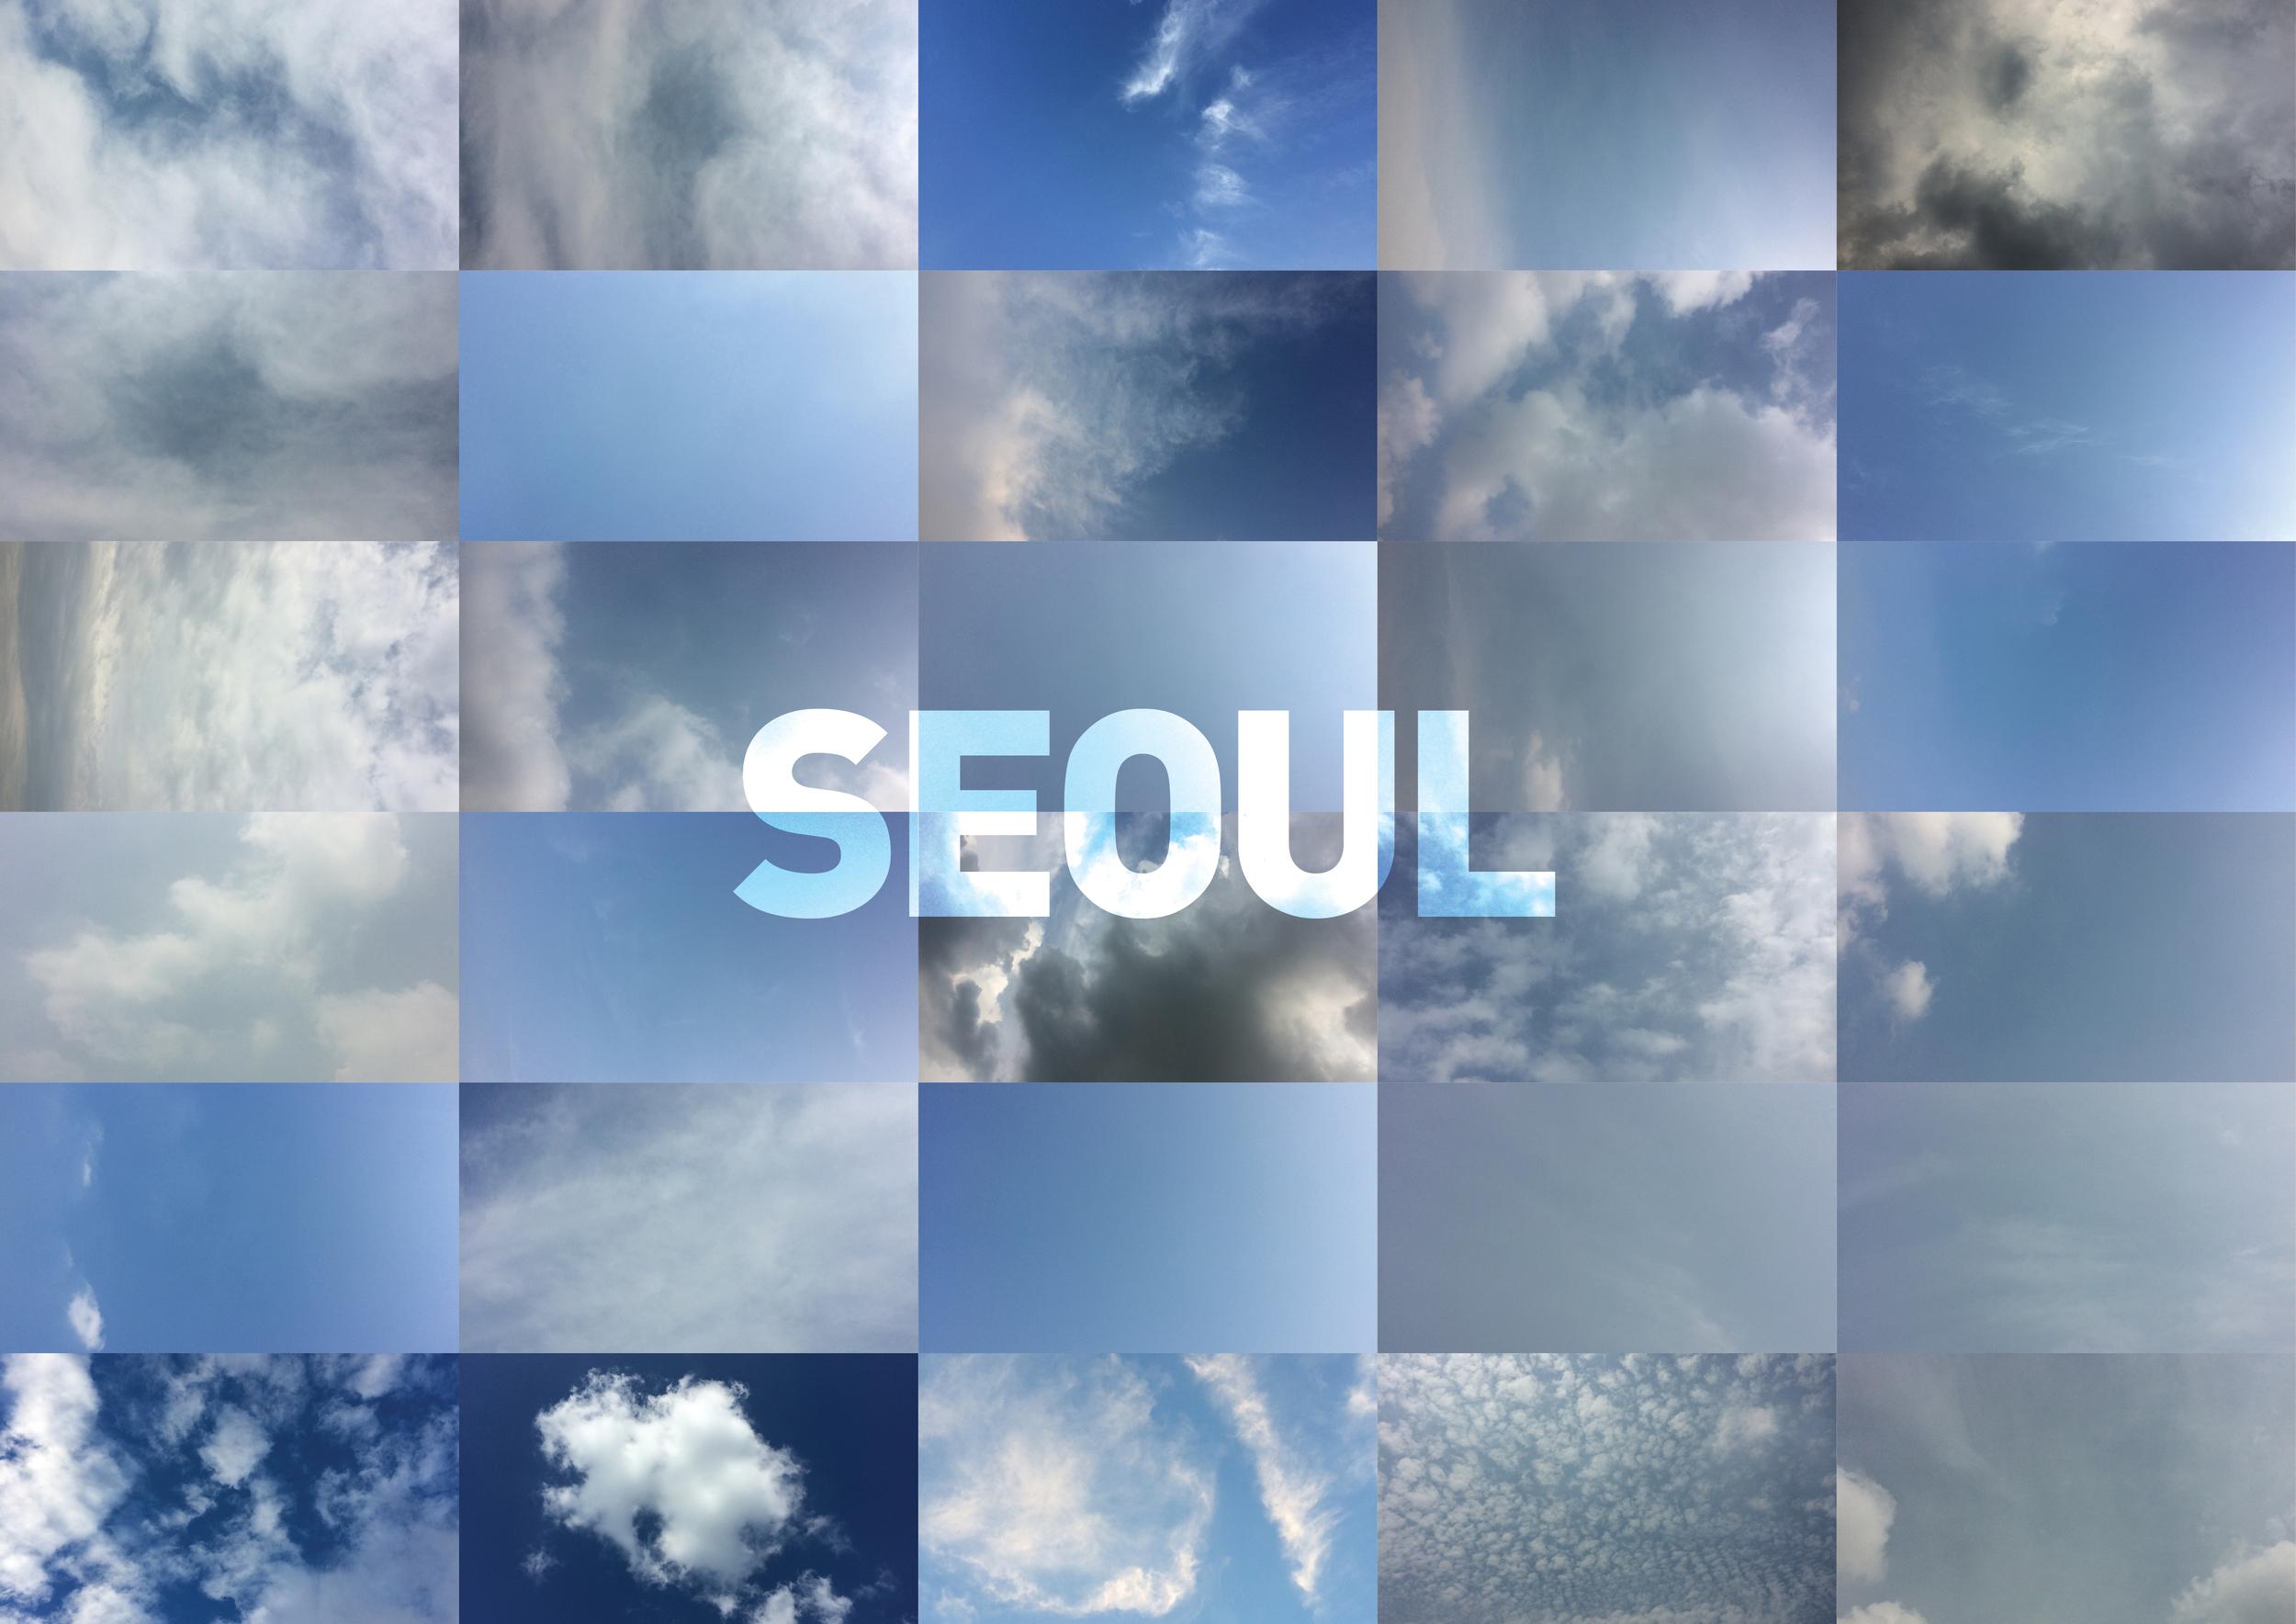 SKY3_SEOUL.jpg